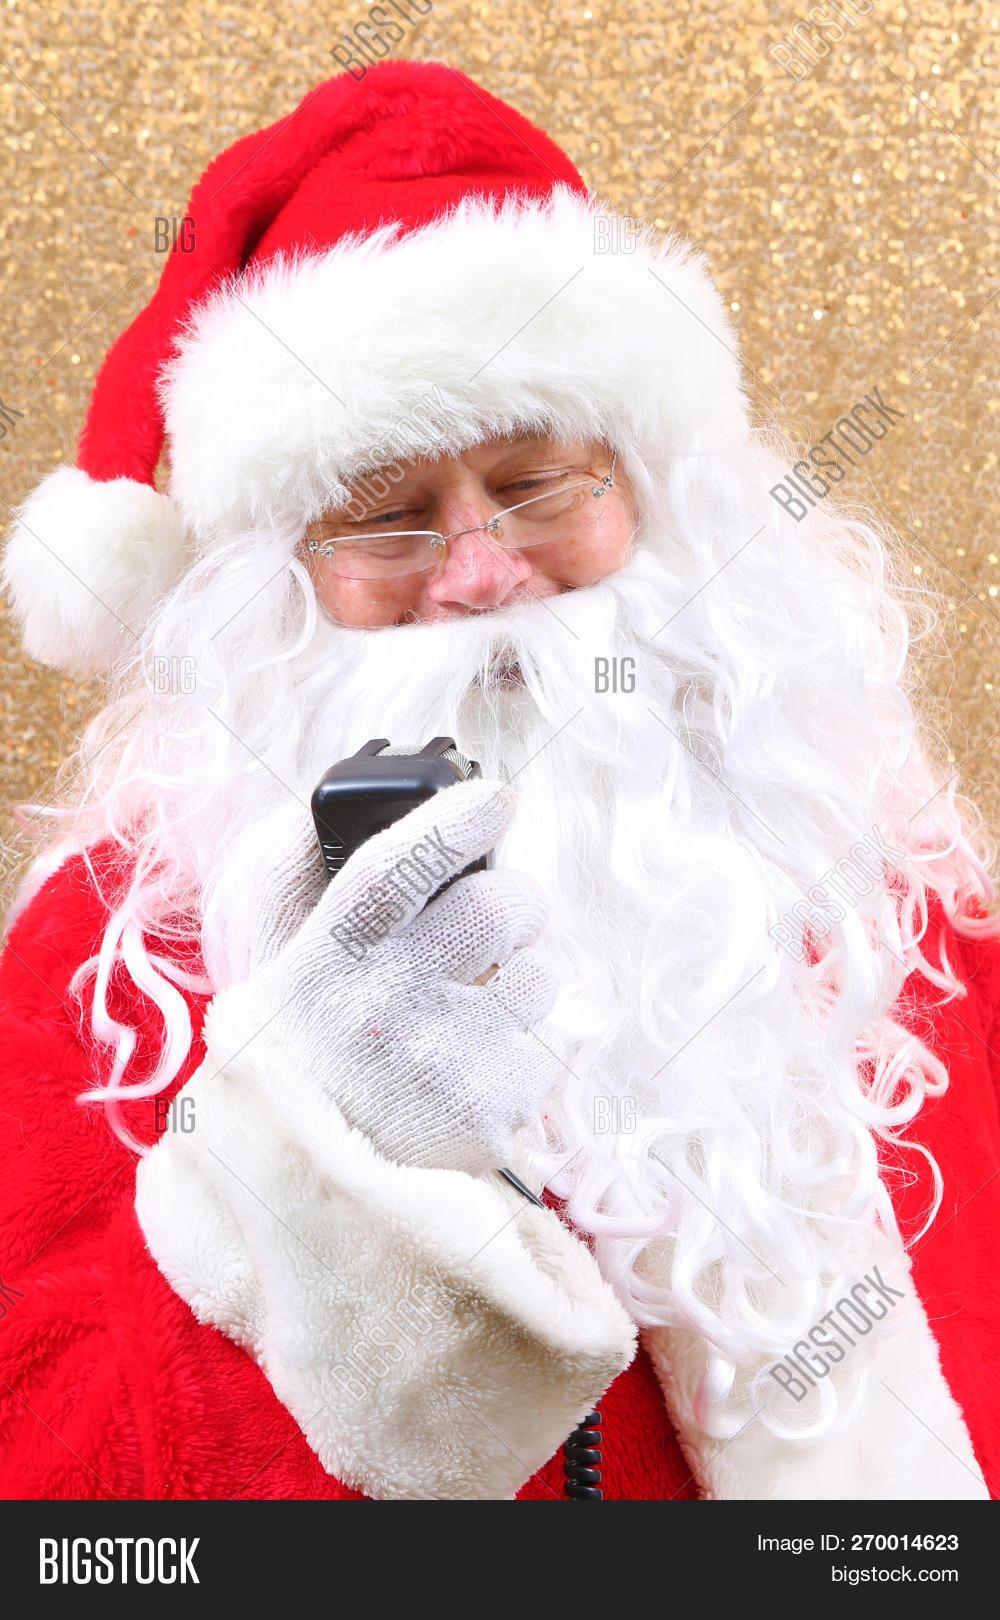 Free Christmas Radio.Santa Claus Santa Image Photo Free Trial Bigstock